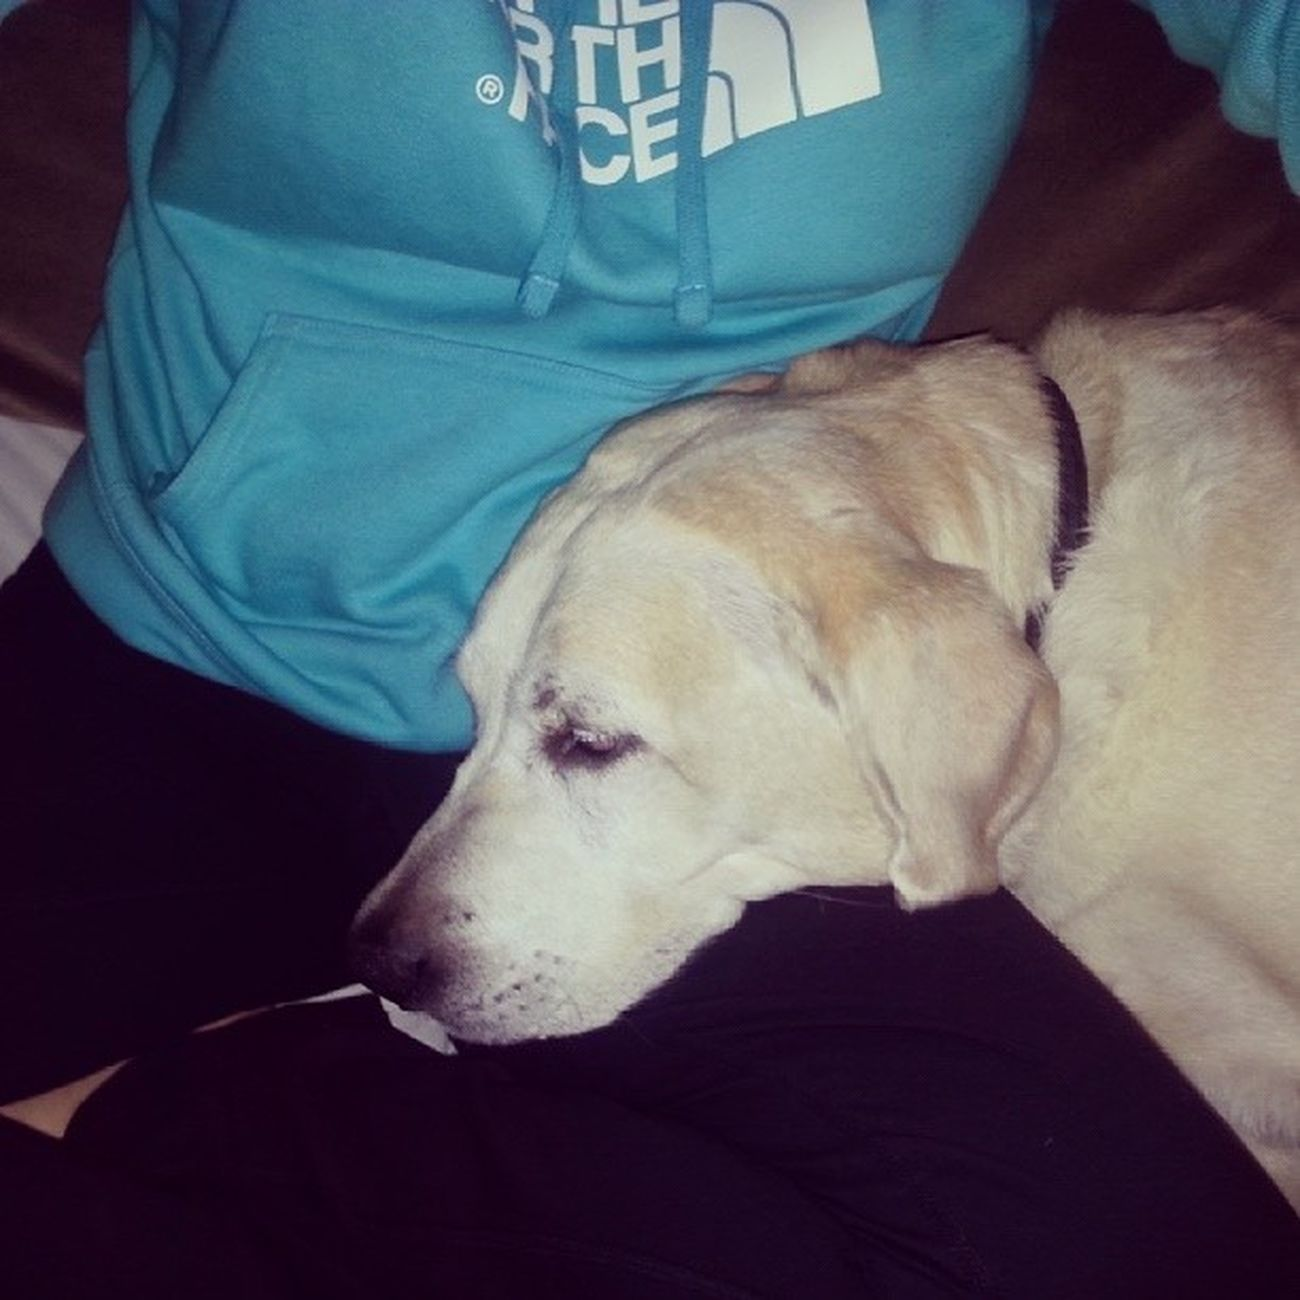 Lovethisdog MAXI Loveher Bestdogever cuddles specialtimes snoring cute shelovesme